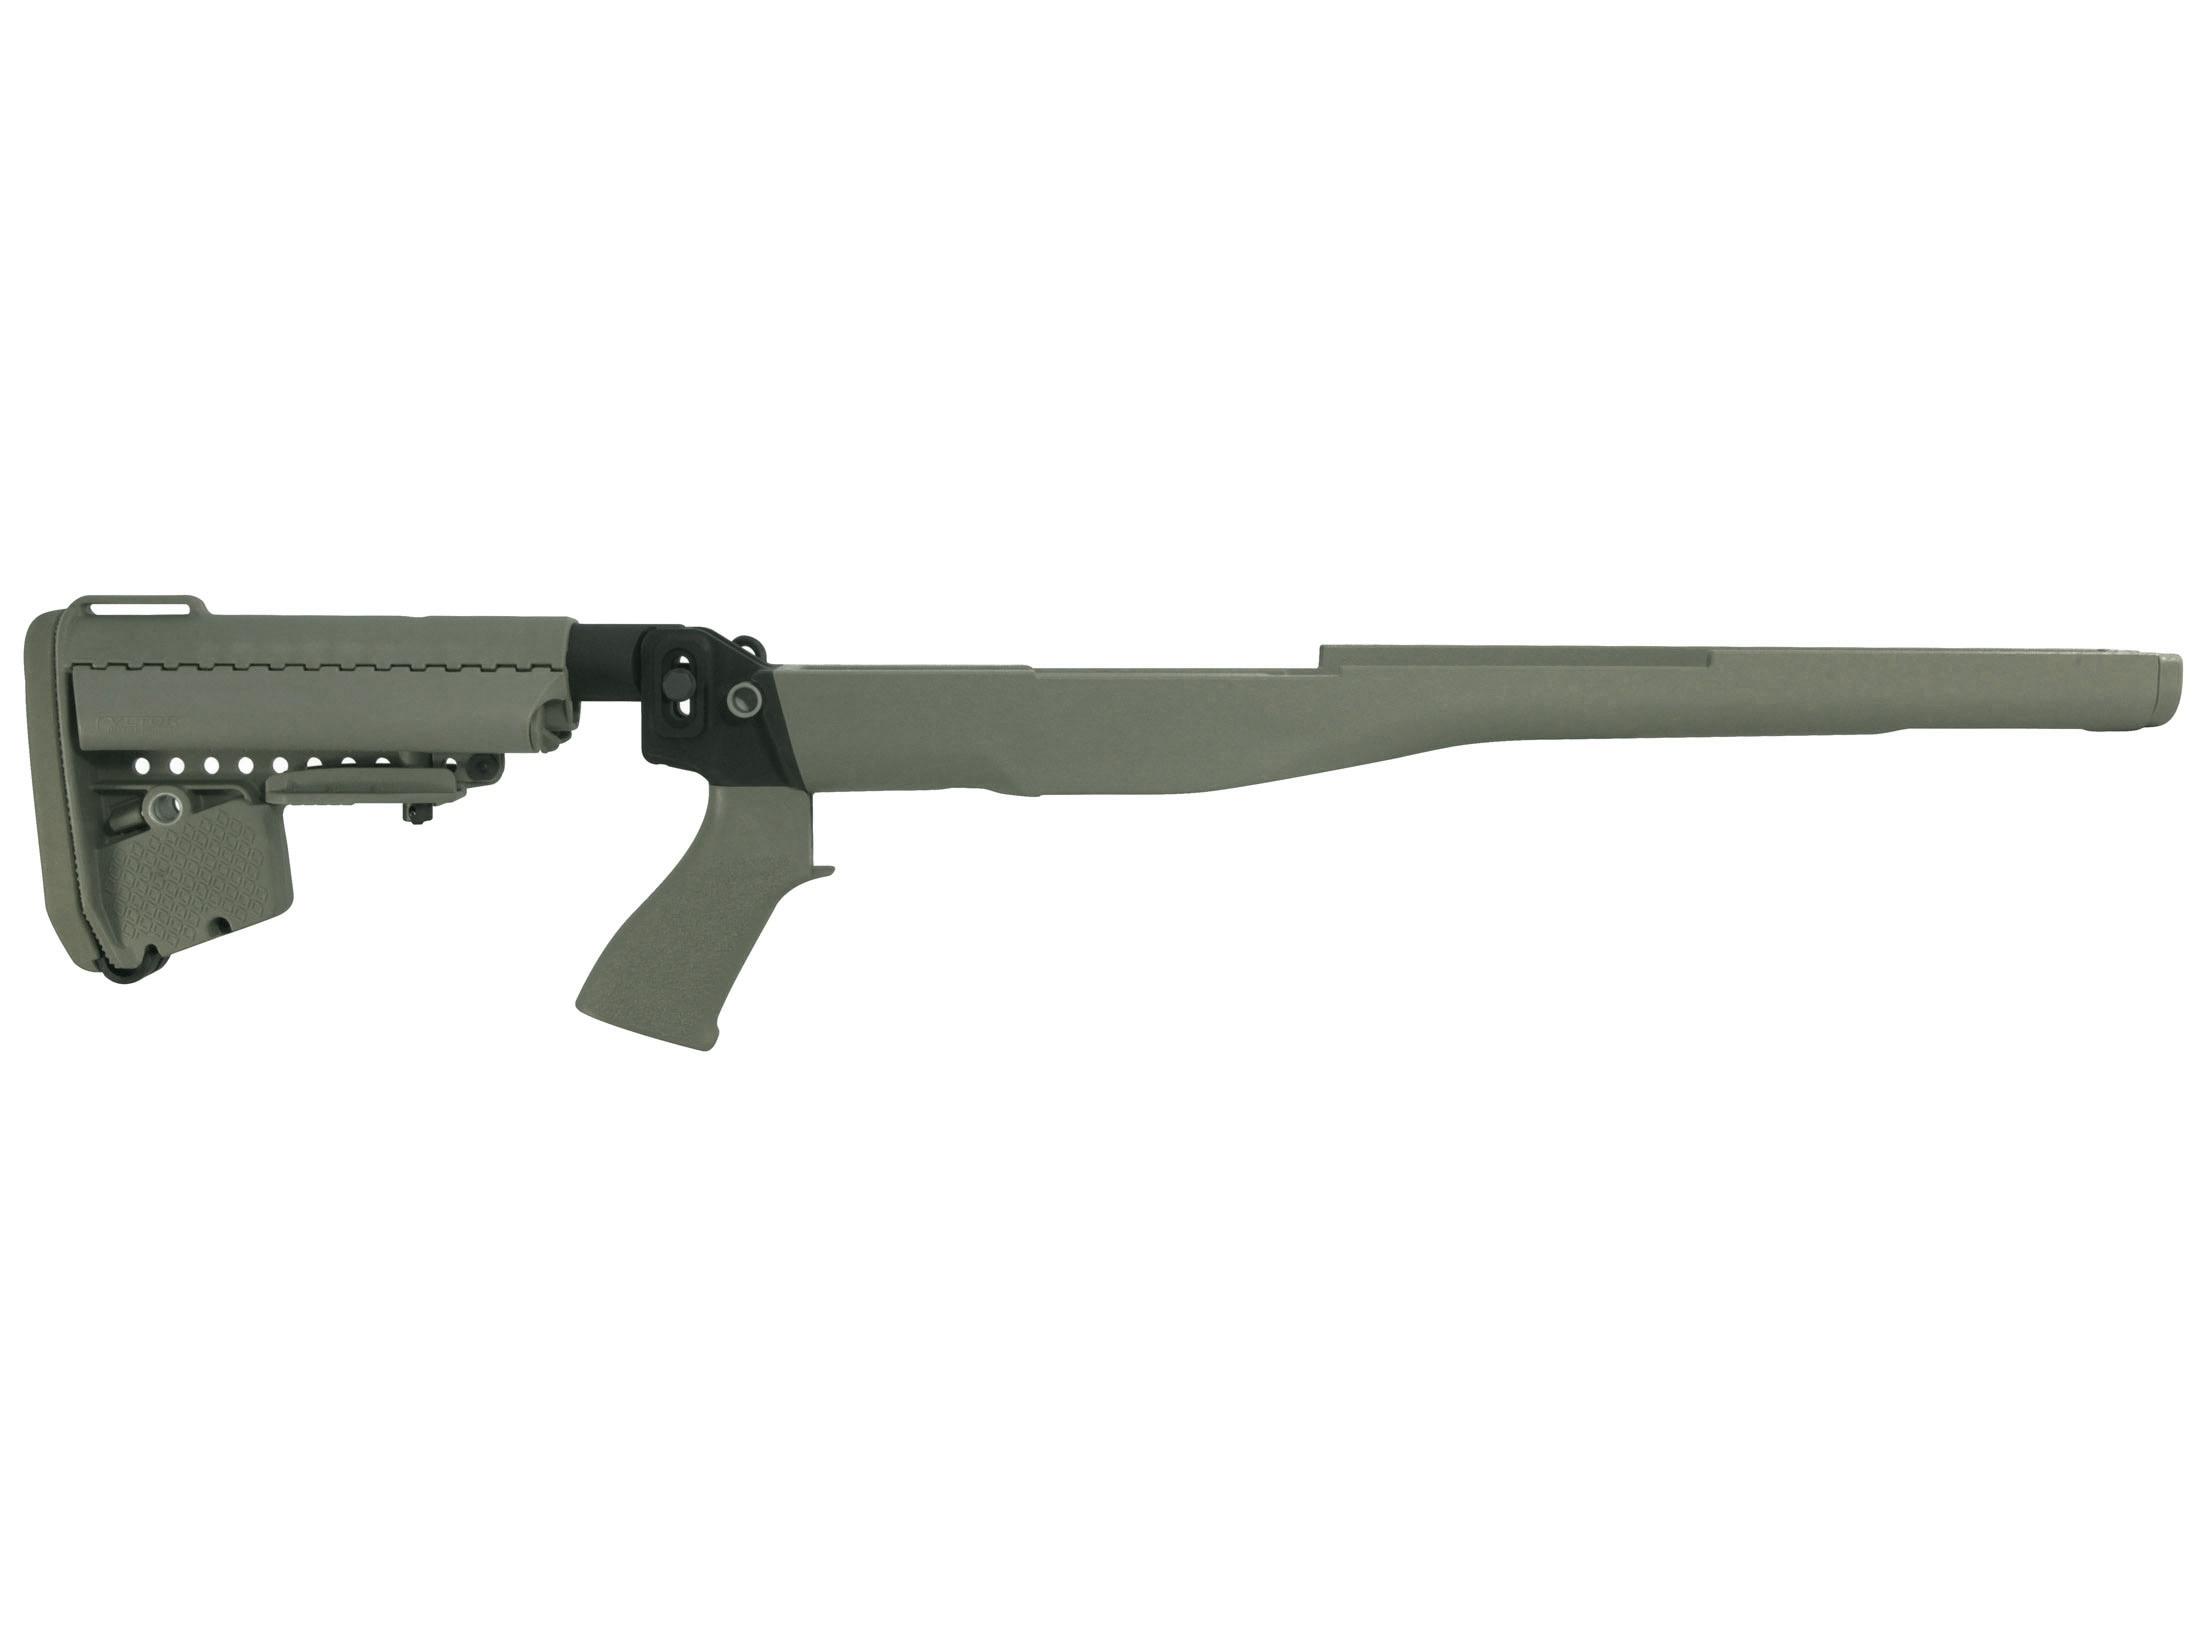 Vltor M1-S Improved Modstock System M14 M1A Synthetic Black